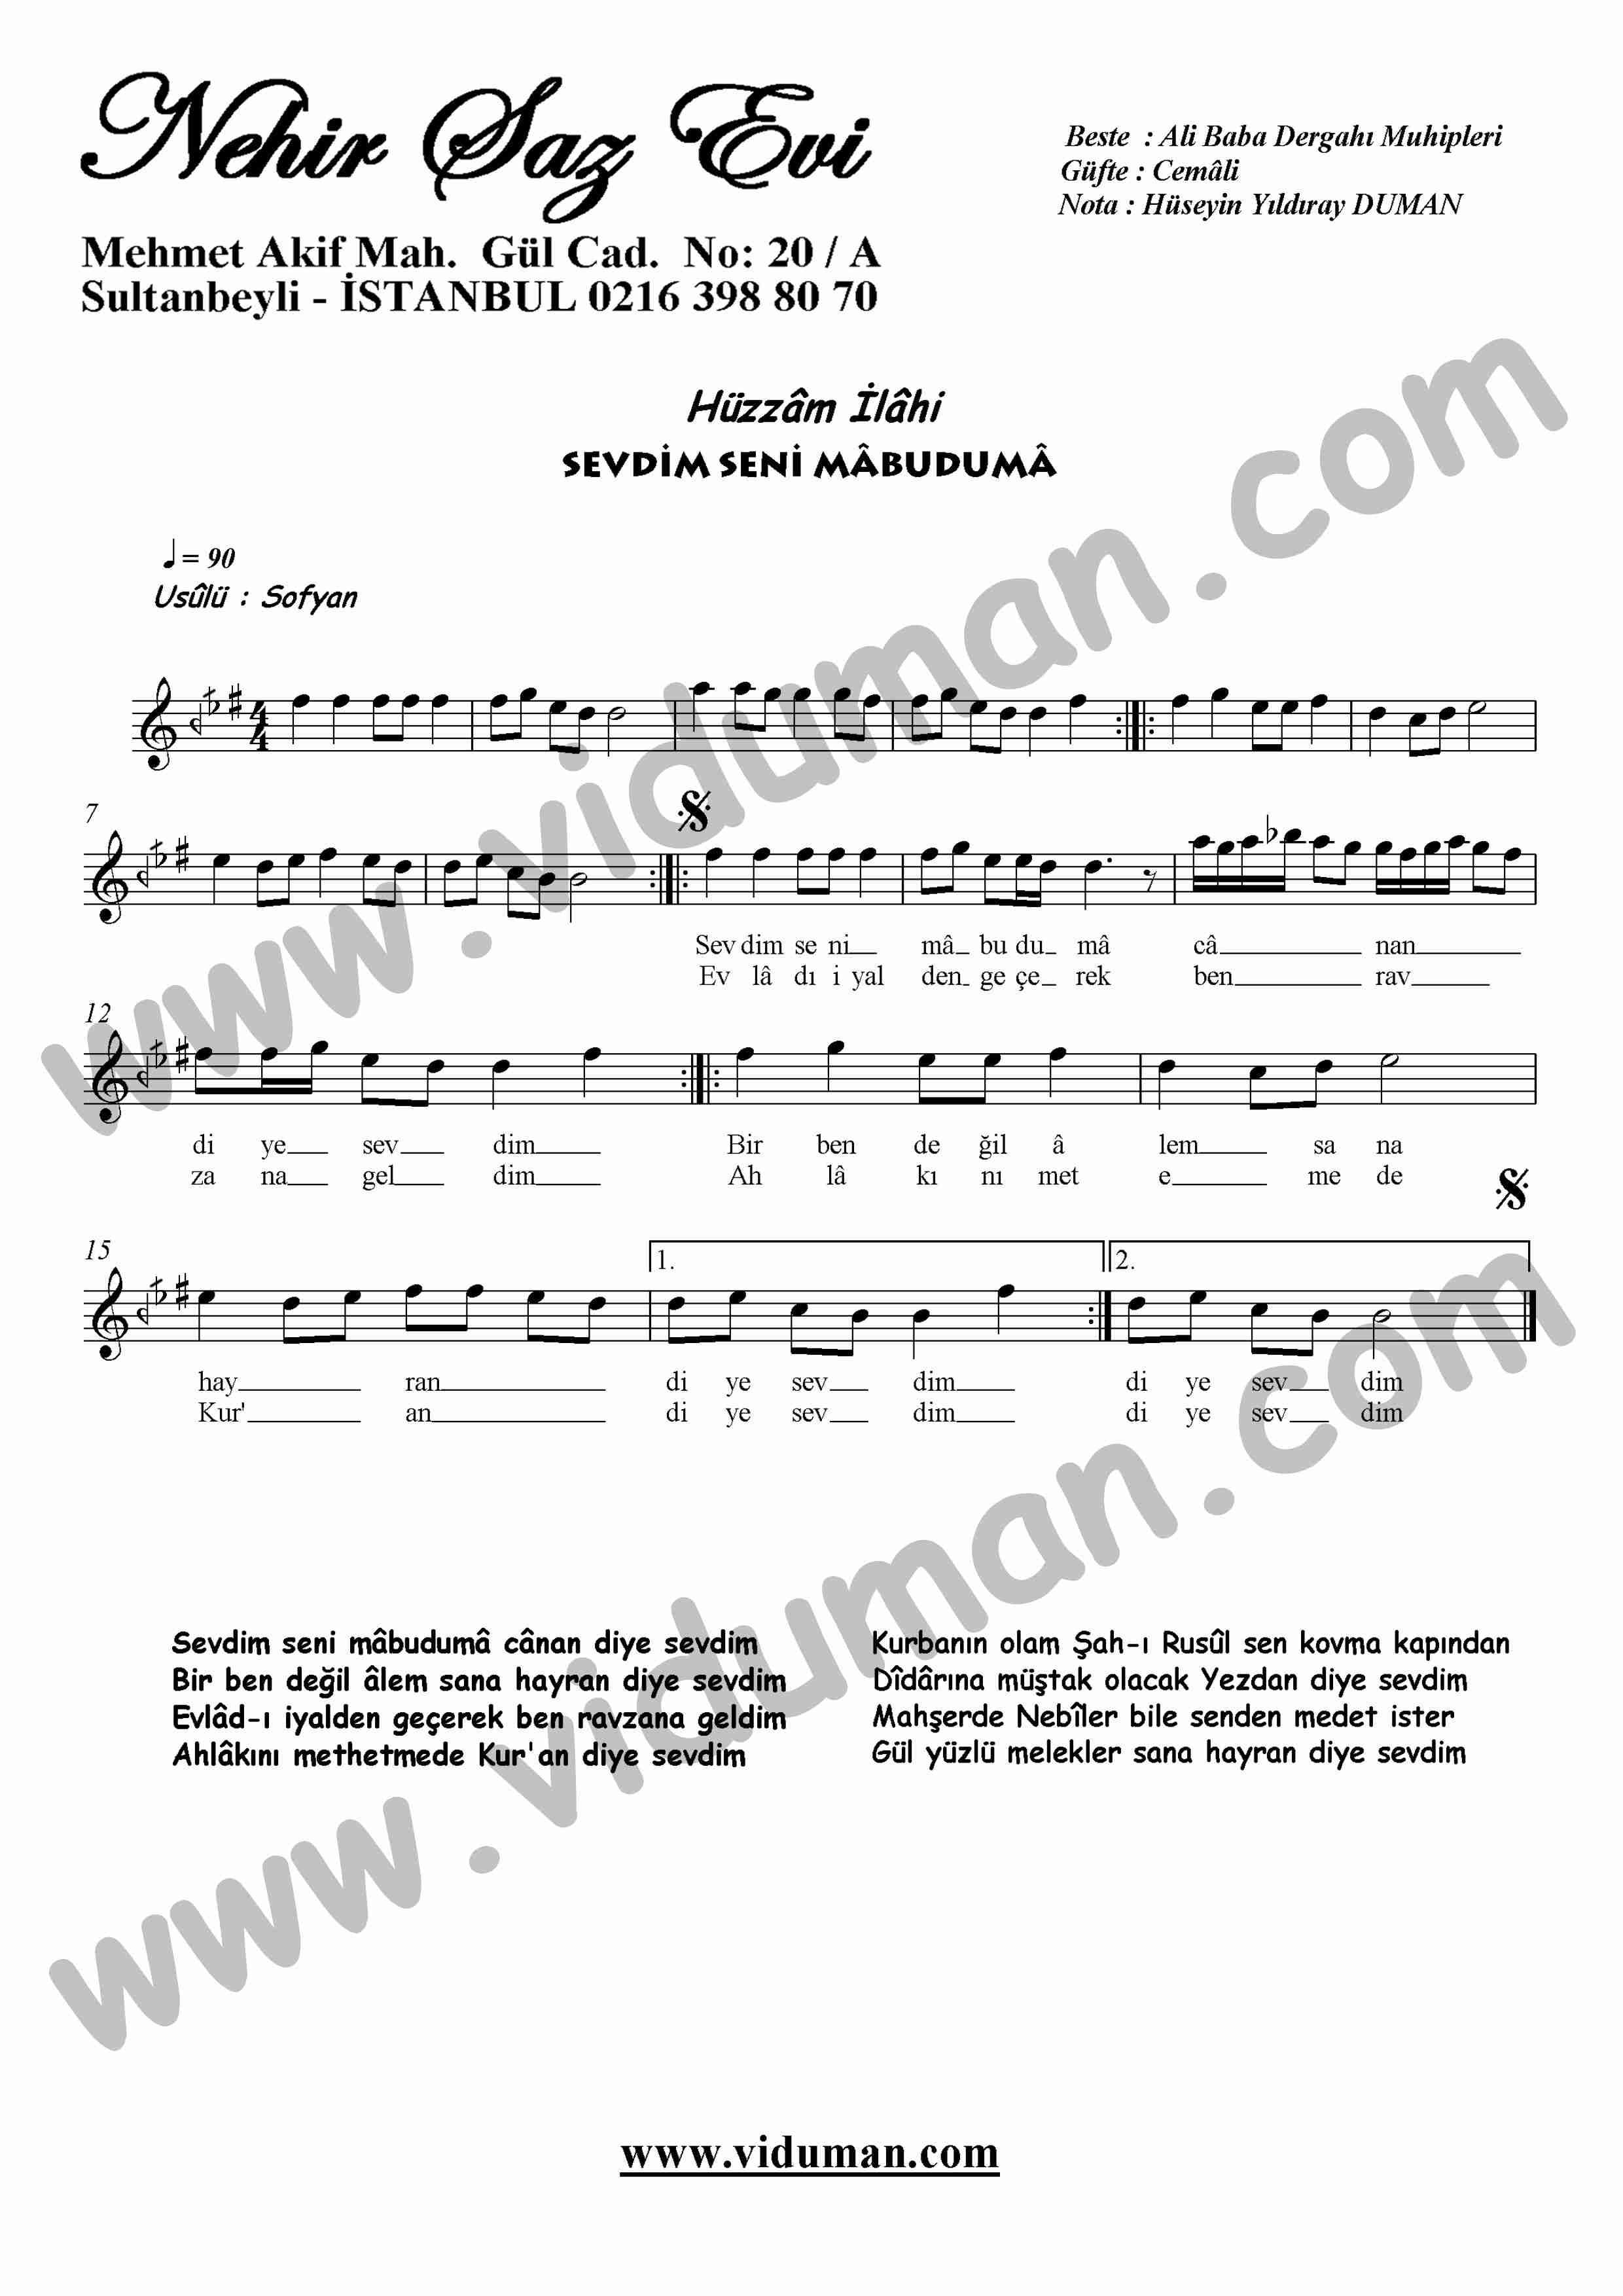 Sevdim Seni Mabuduma-Ney-Ilahi-Notalari